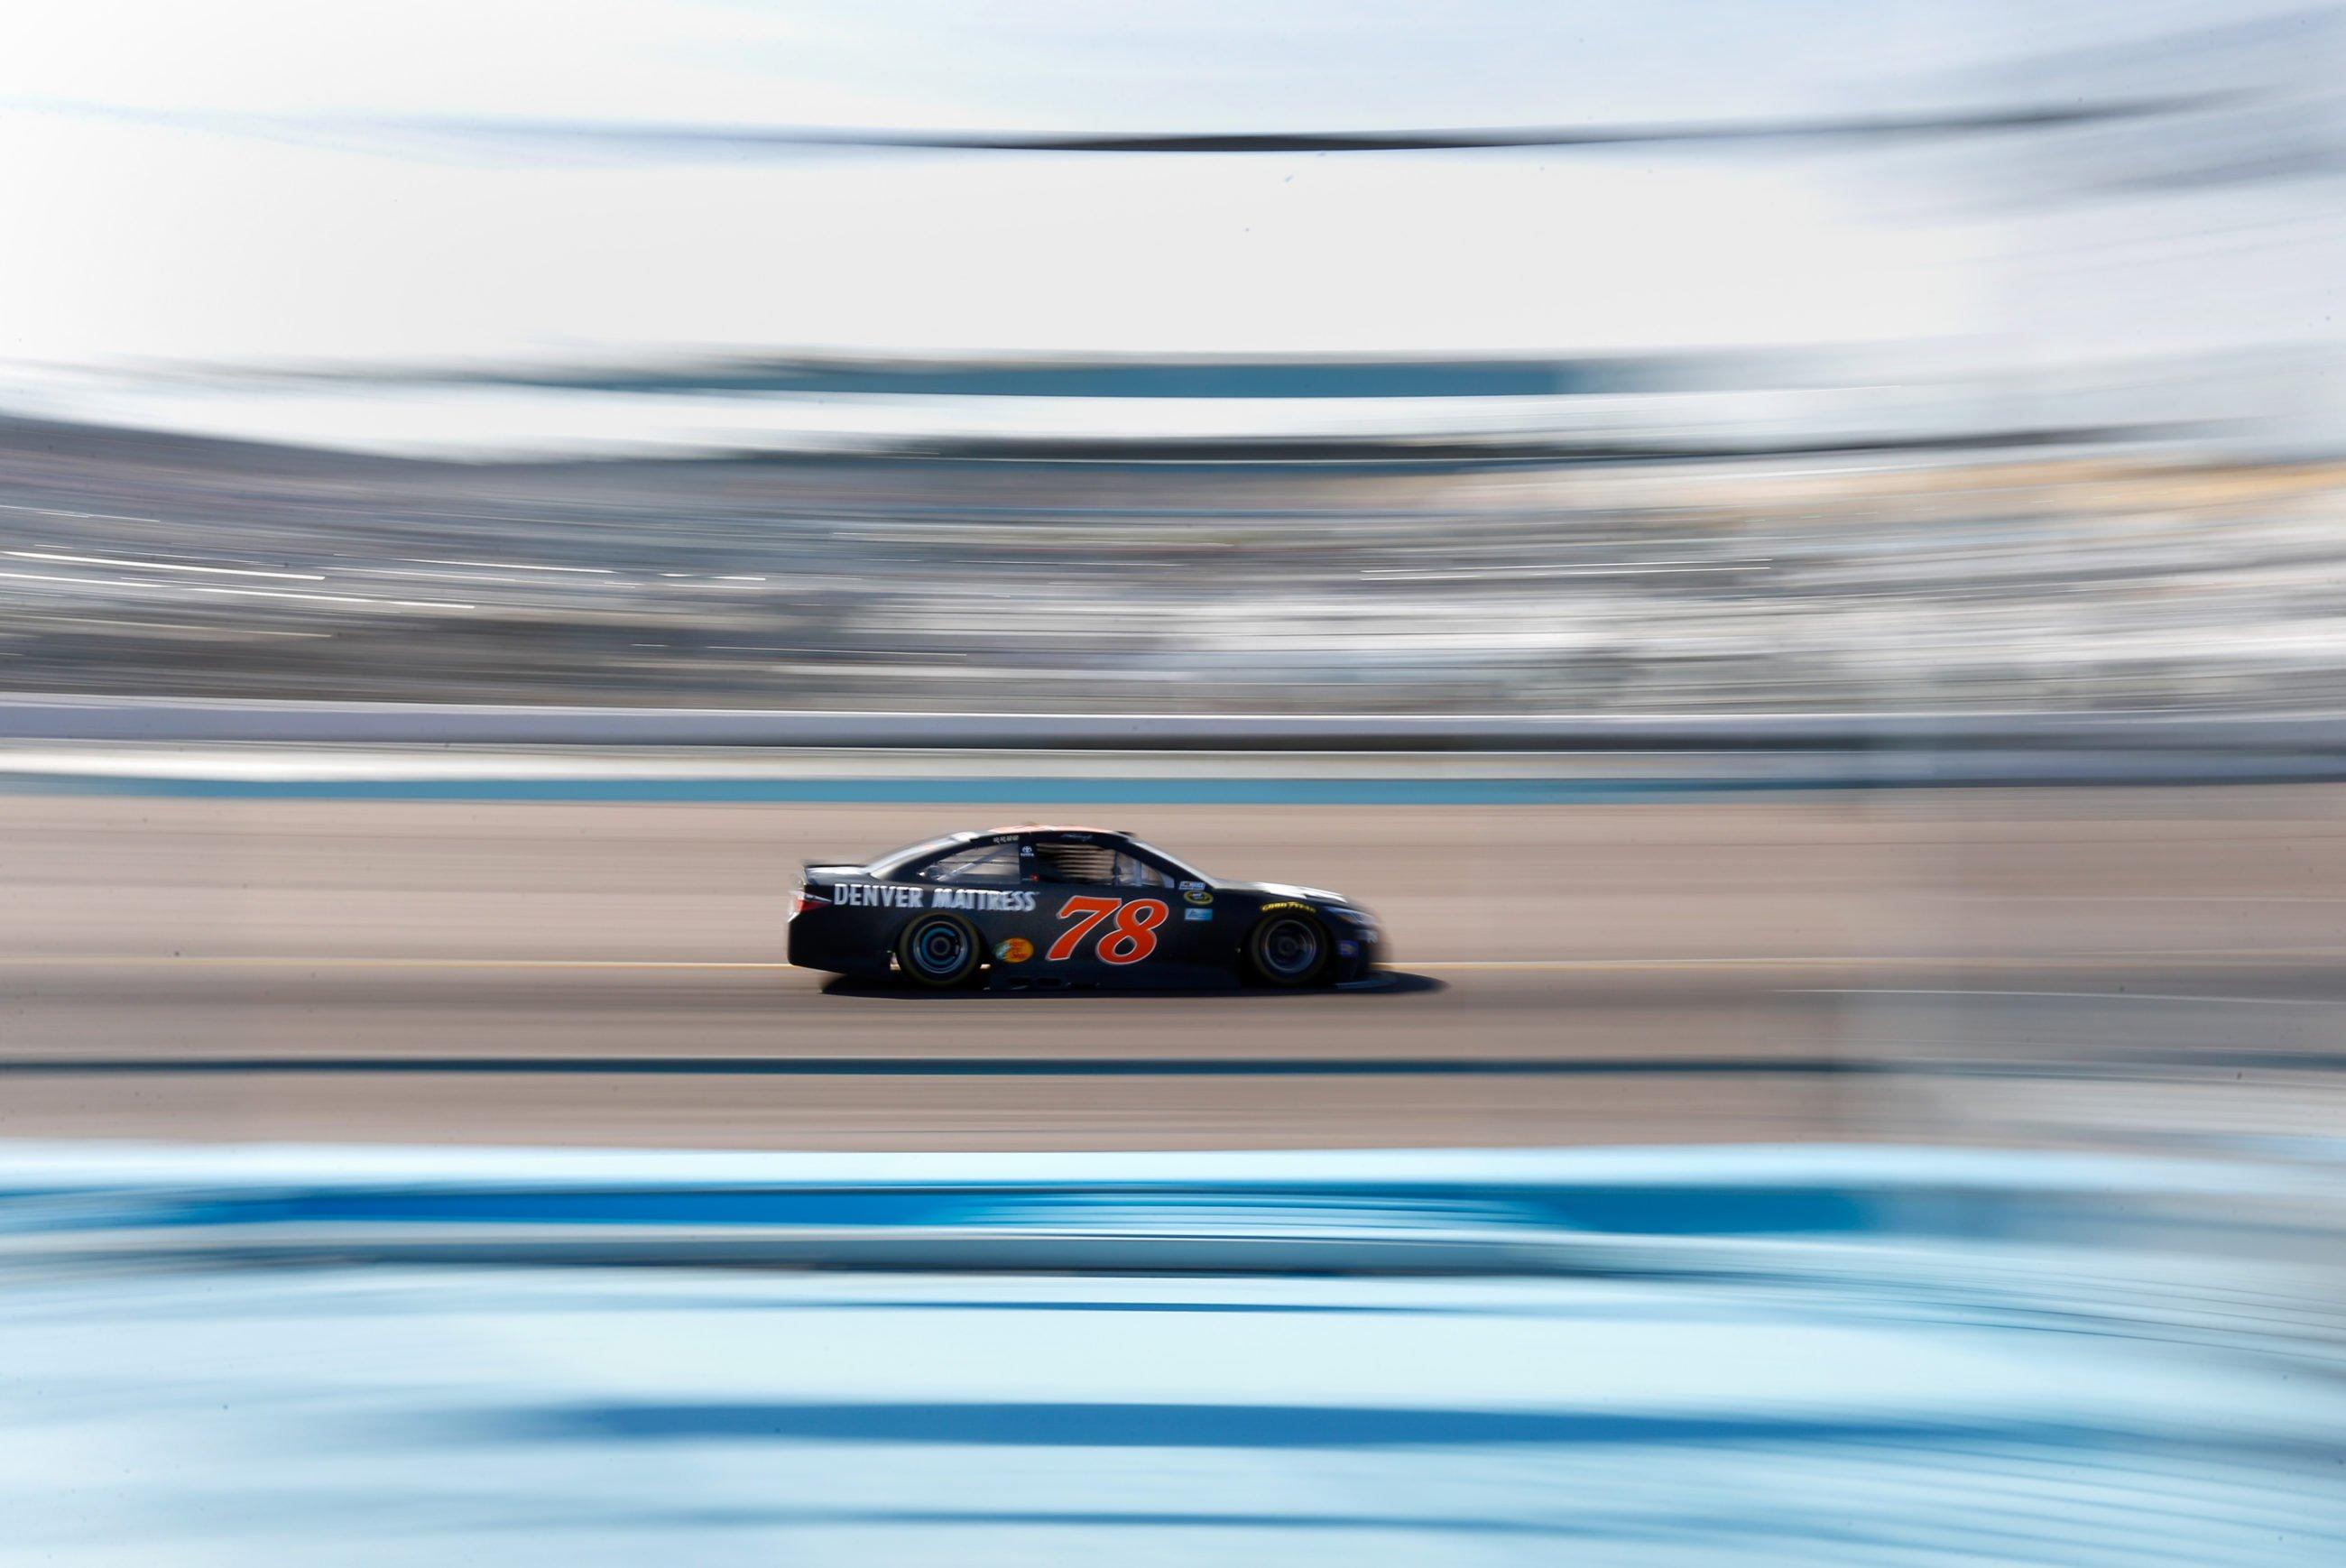 Pull up to Pit Penalty - Phoenix International Raceway